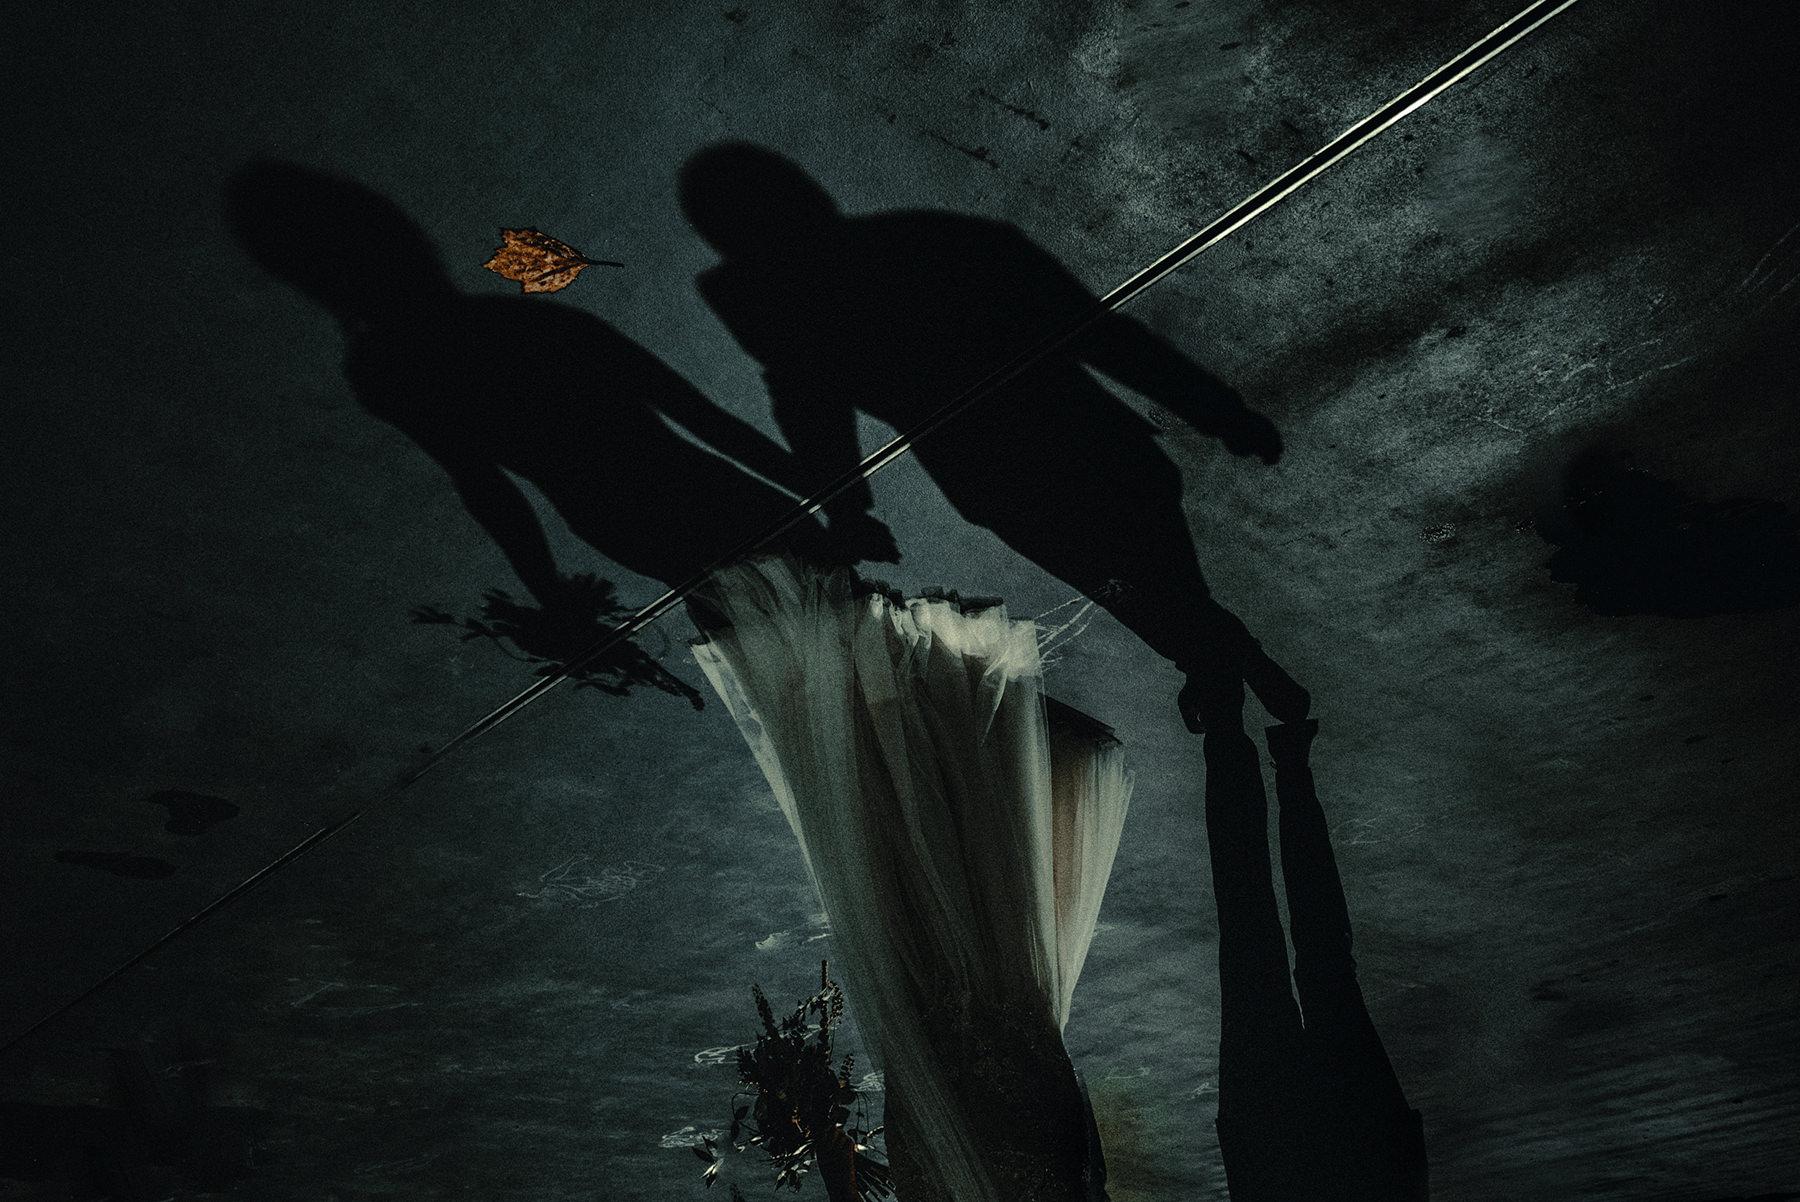 Moody trouwfotografie | Fine art trouwfotografie | Trouwreportage